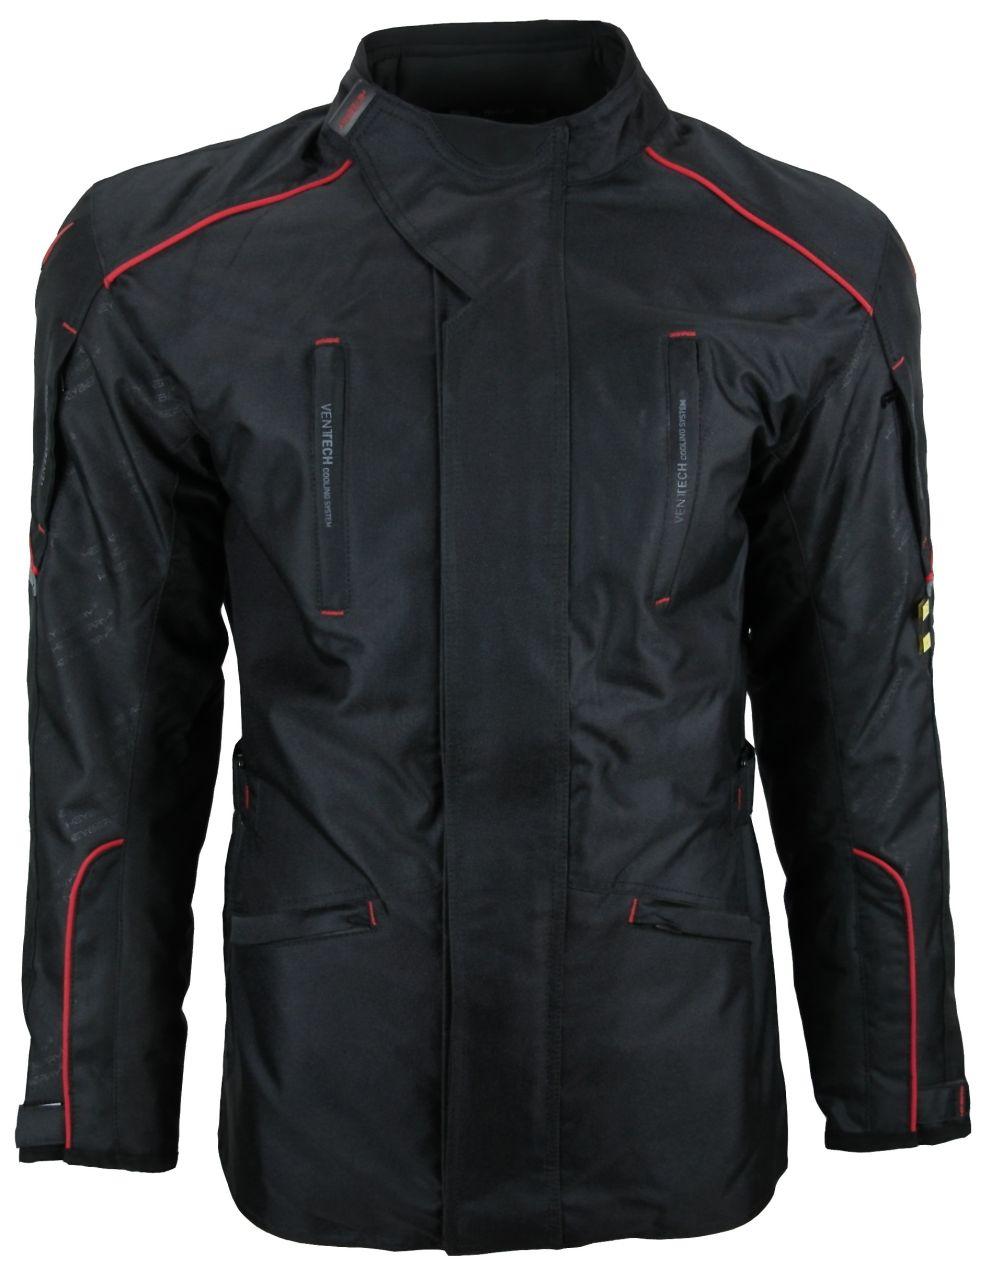 Heyberry Textil Touren Motorradjacke Motorrad Jacke schwarz rot Gr. M-3XL